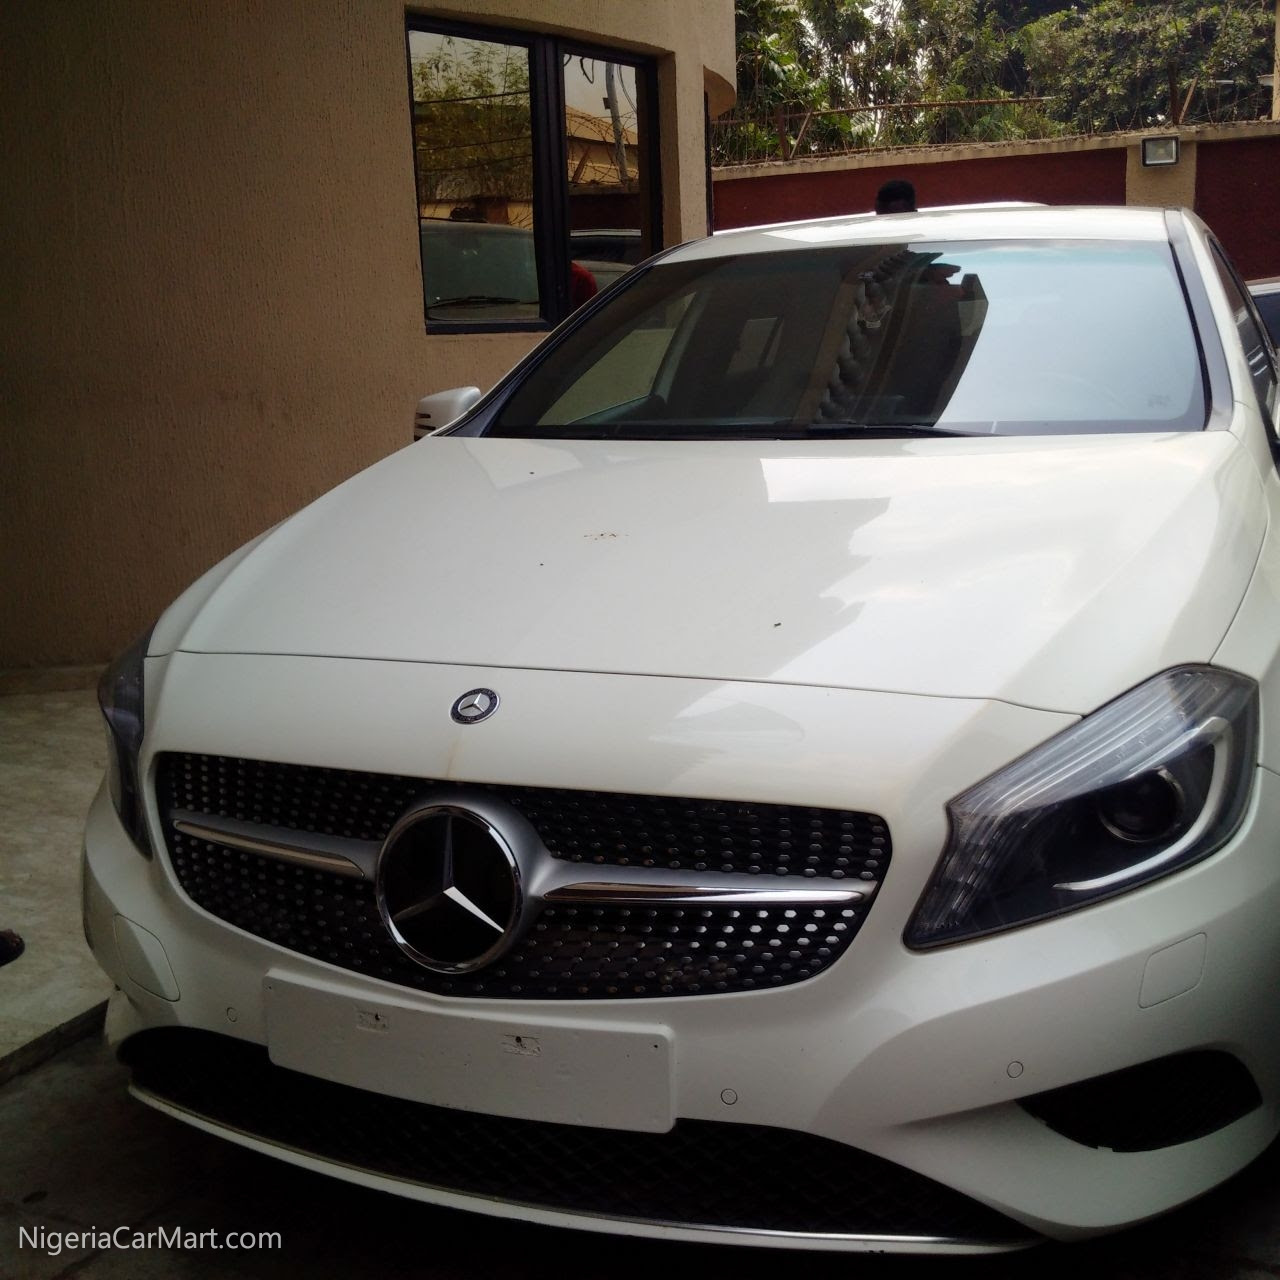 2015 Mercedes Benz C250 used car for sale in Lagos Nigeria ...